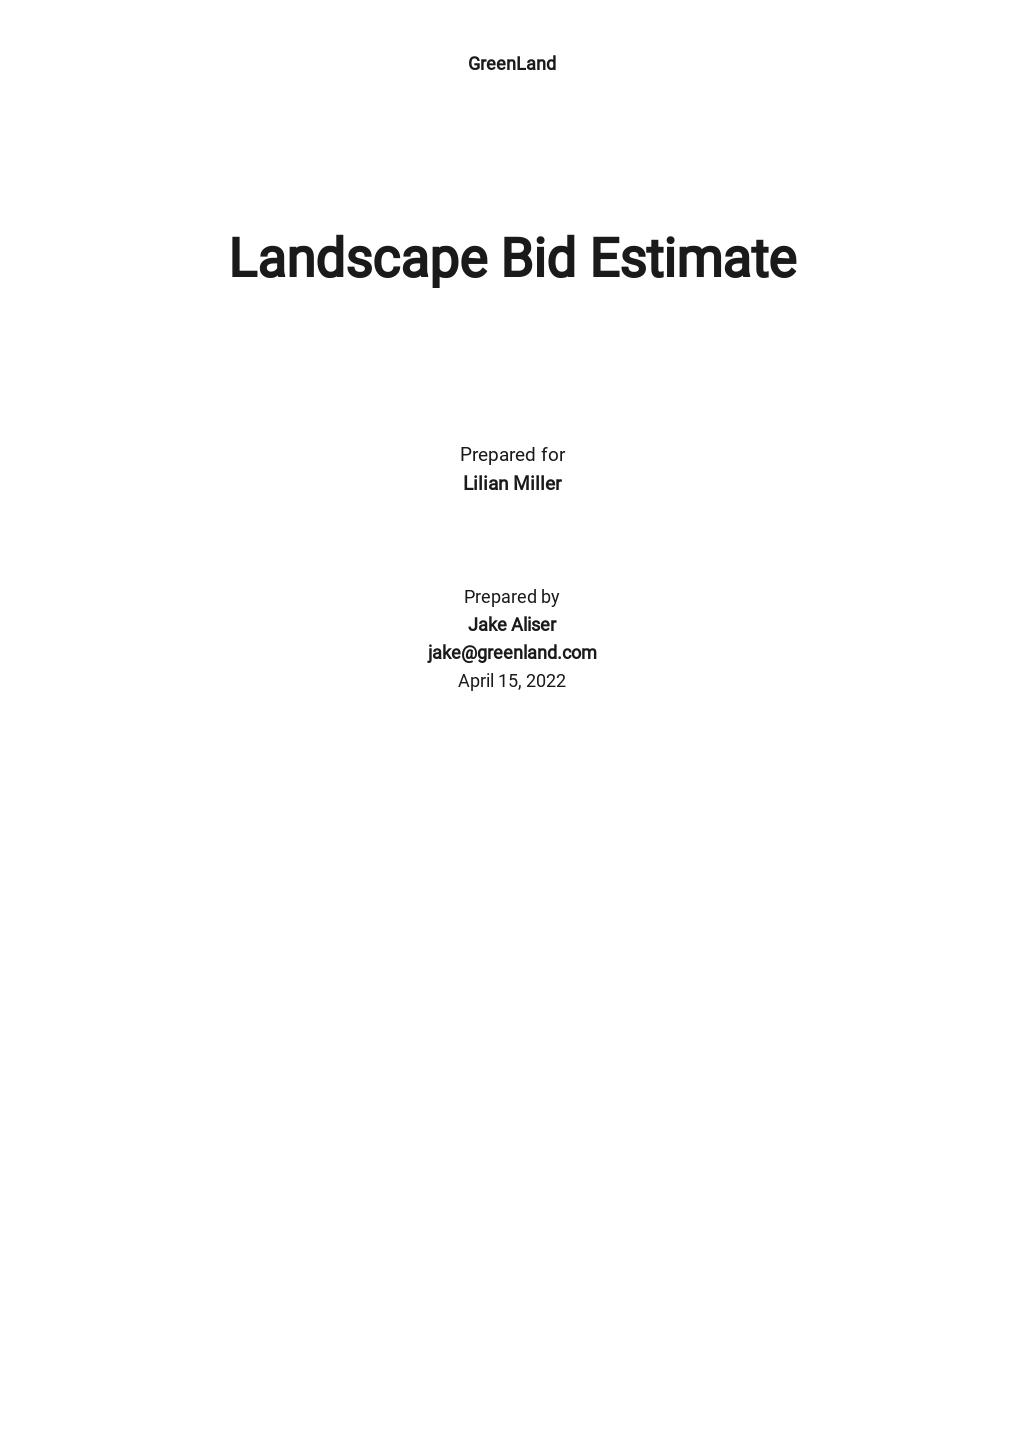 Landscape Bid Estimate Template